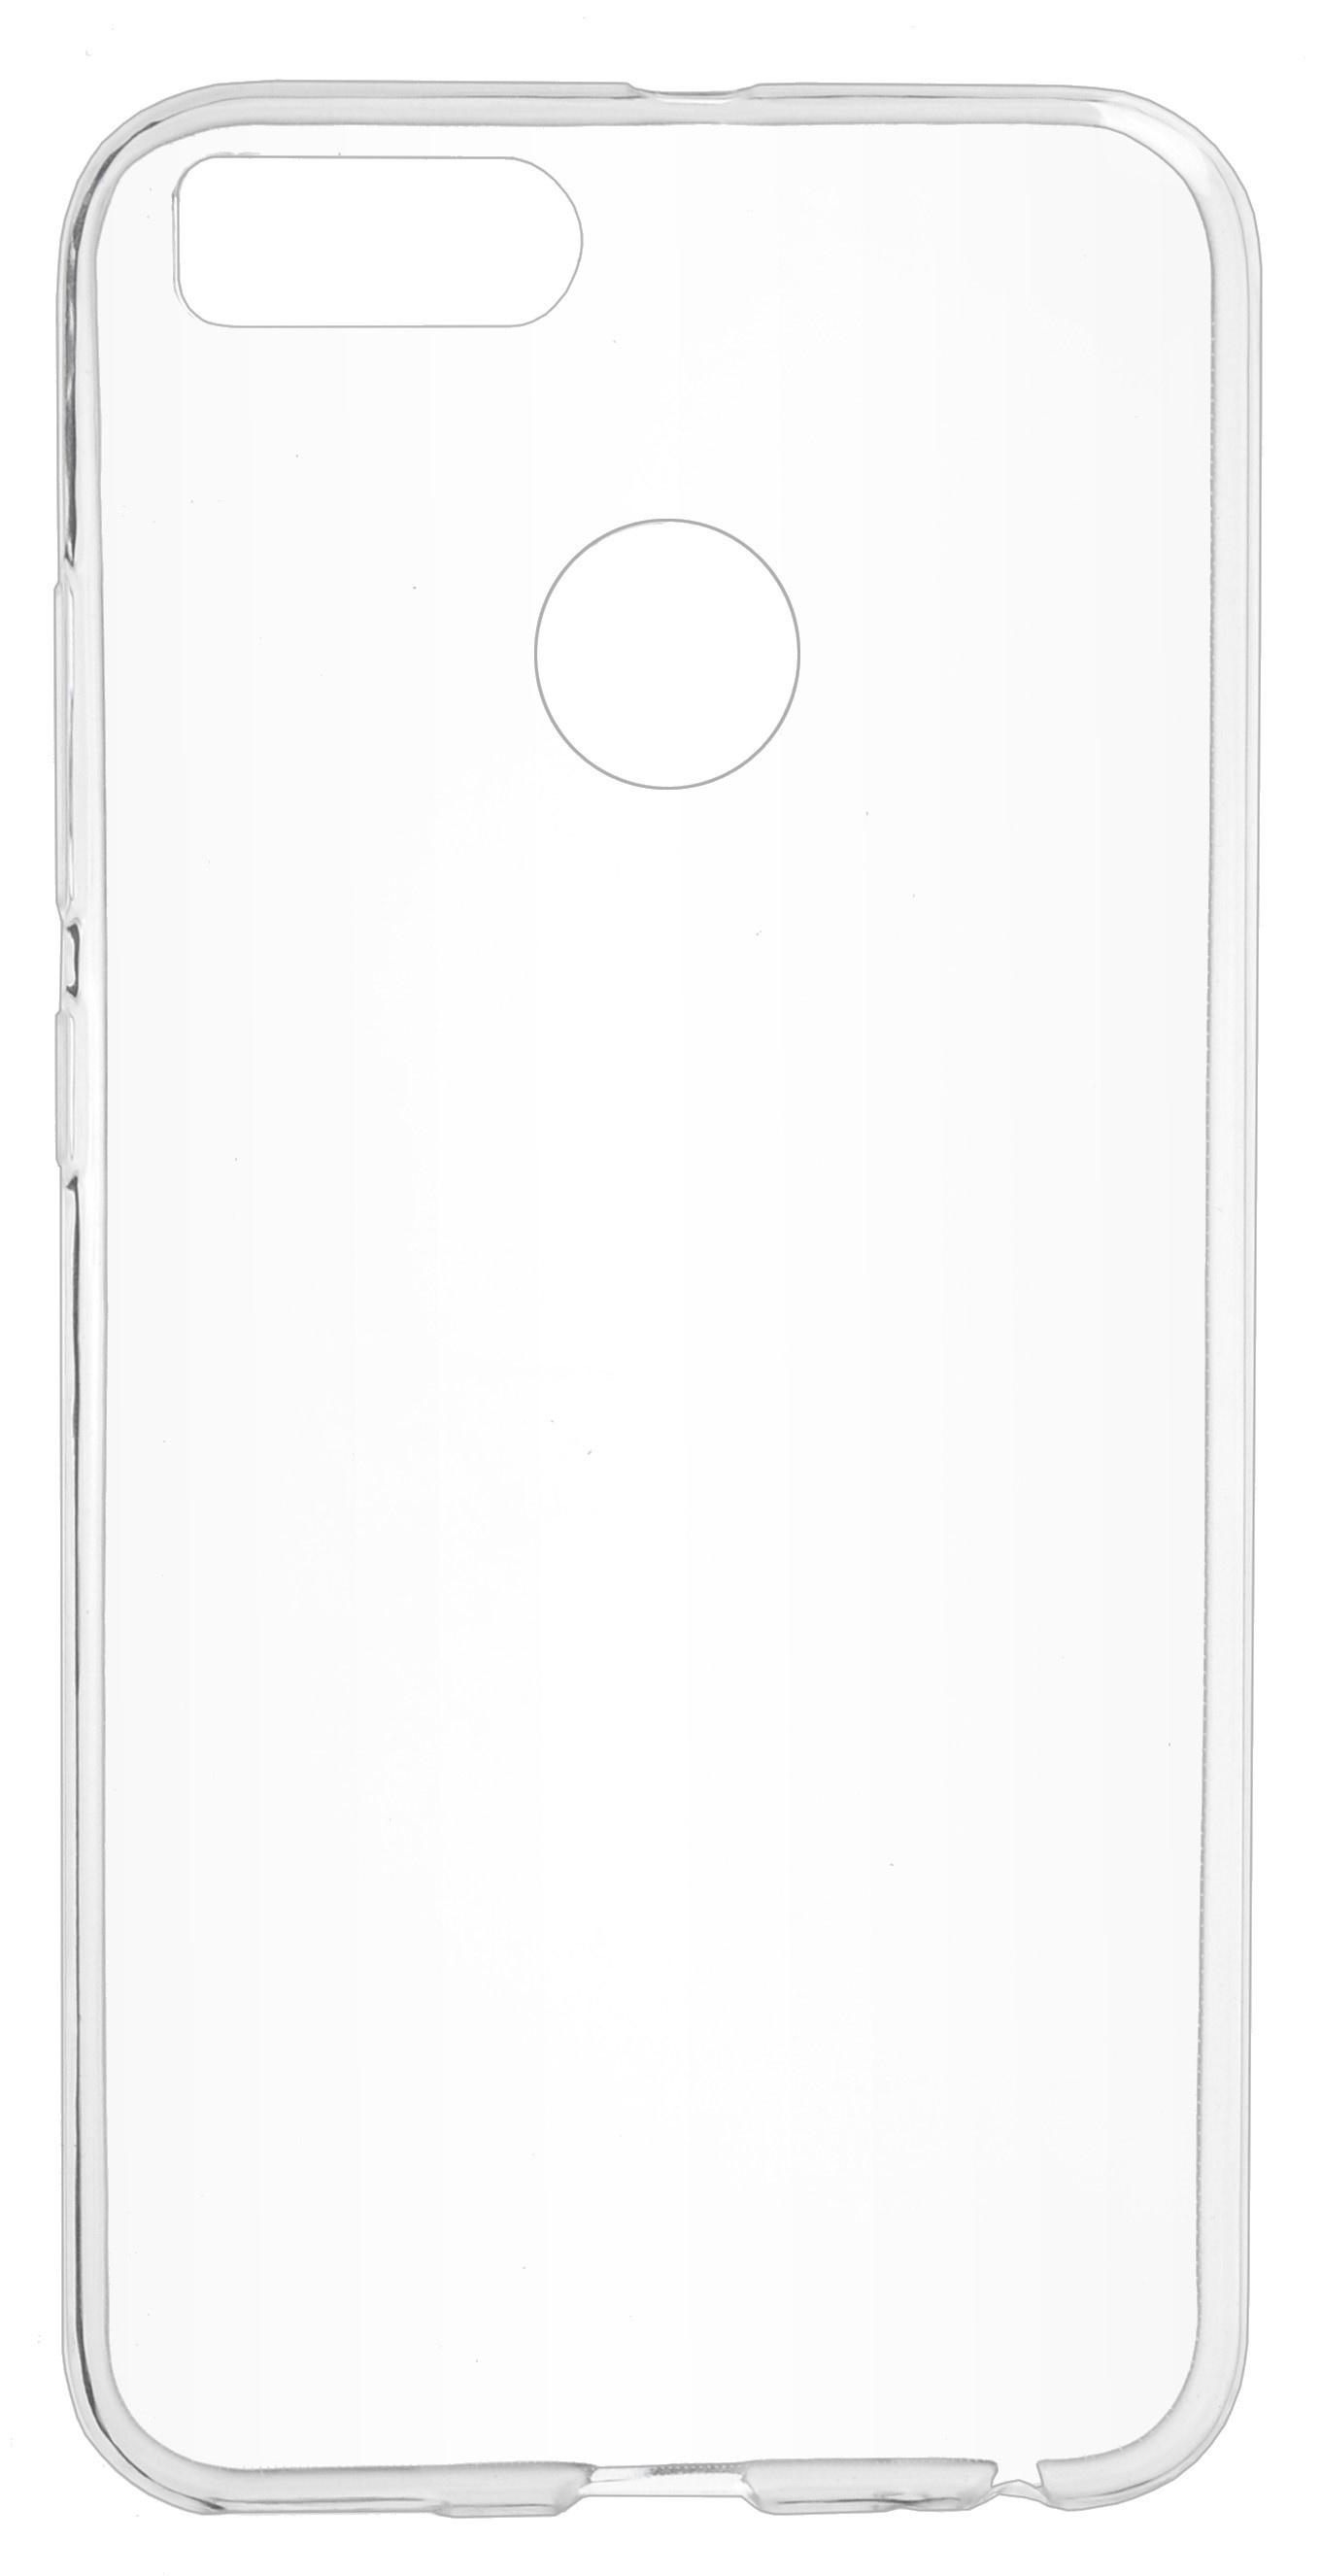 Чехол для сотового телефона skinBOX Slim Silicone, 4660041409390, прозрачный цены онлайн